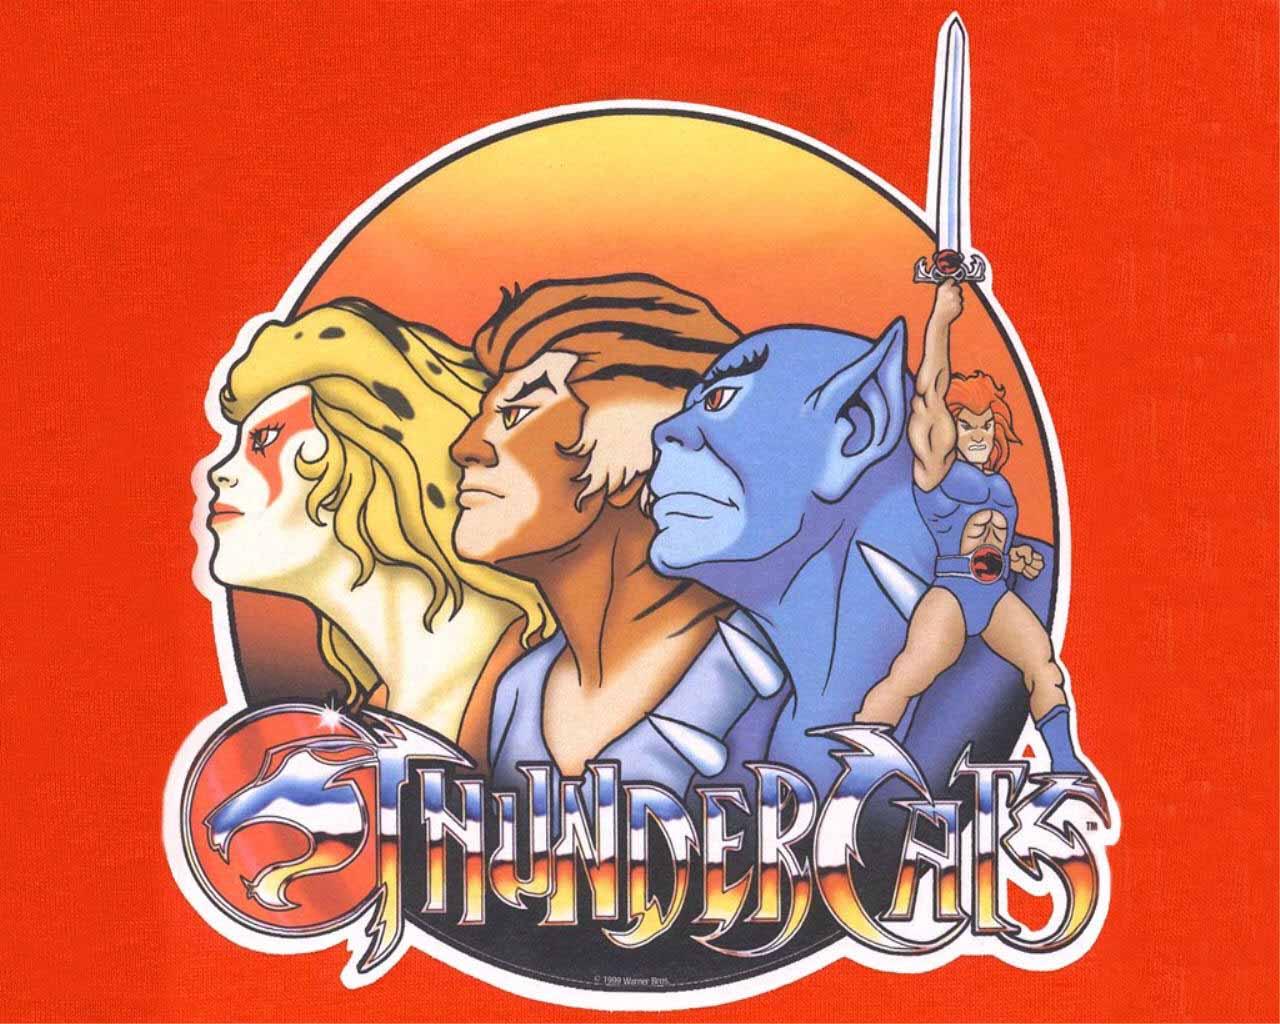 http://1.bp.blogspot.com/_Y9jlk7KvkBA/S8m2CjmXR1I/AAAAAAAABQU/ogC-MOy9m3U/s1600/thundercats+wallpaper-897.jpg